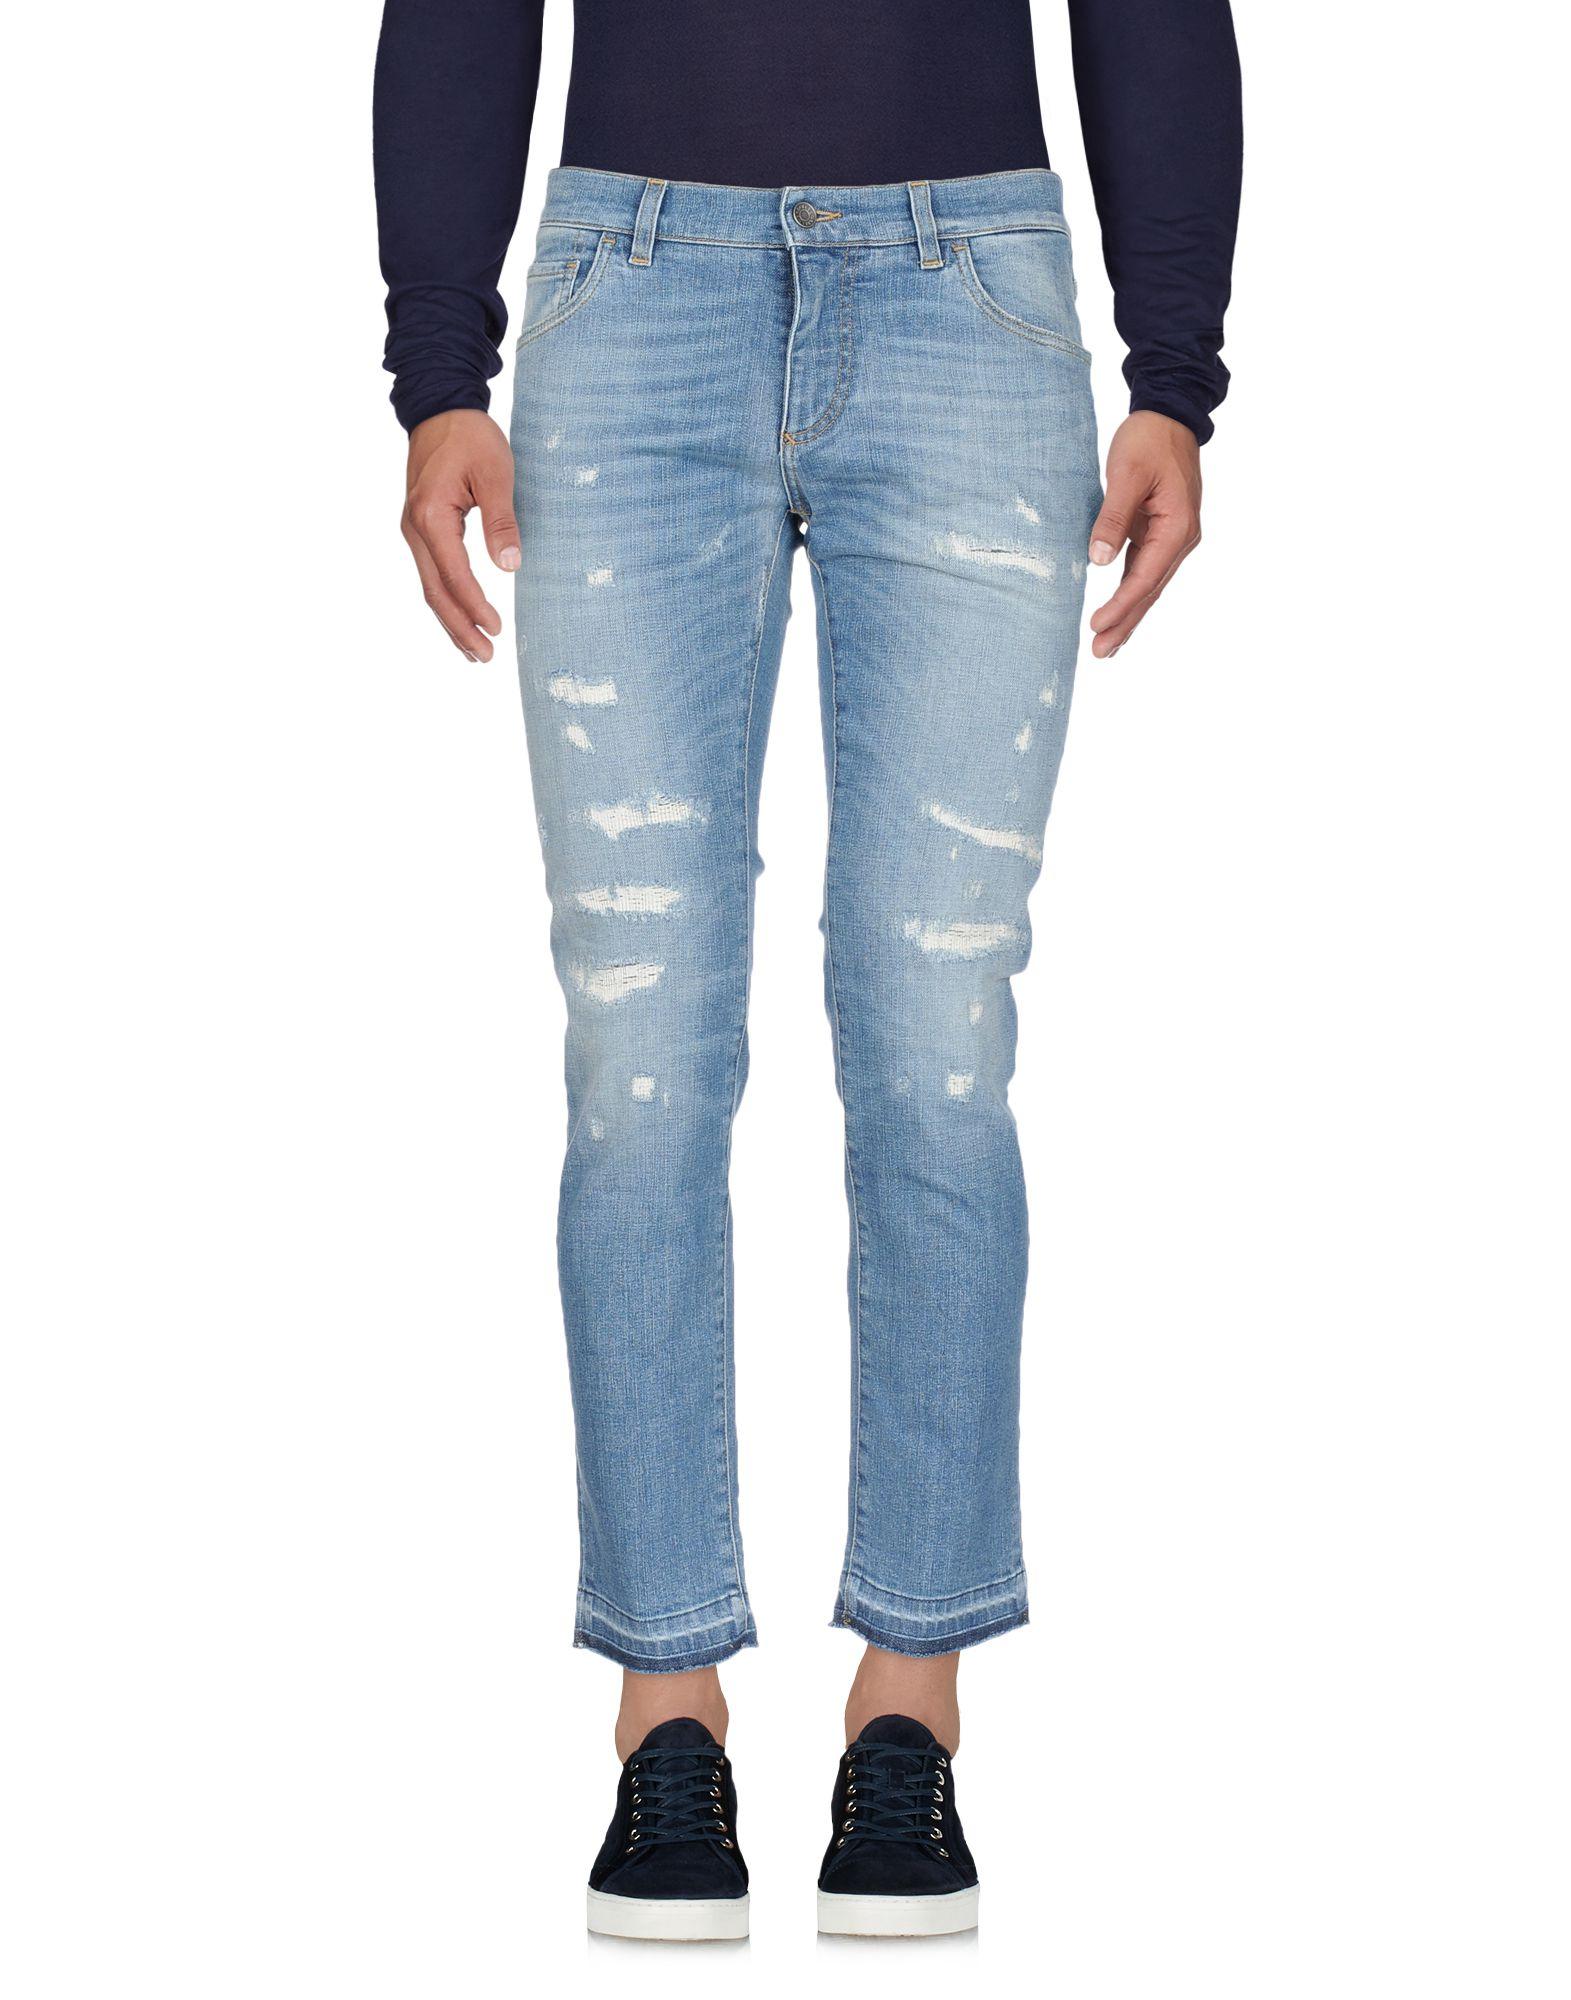 Pantaloni Jeans Dolce & - Gabbana Uomo - & 42677811JL 118402